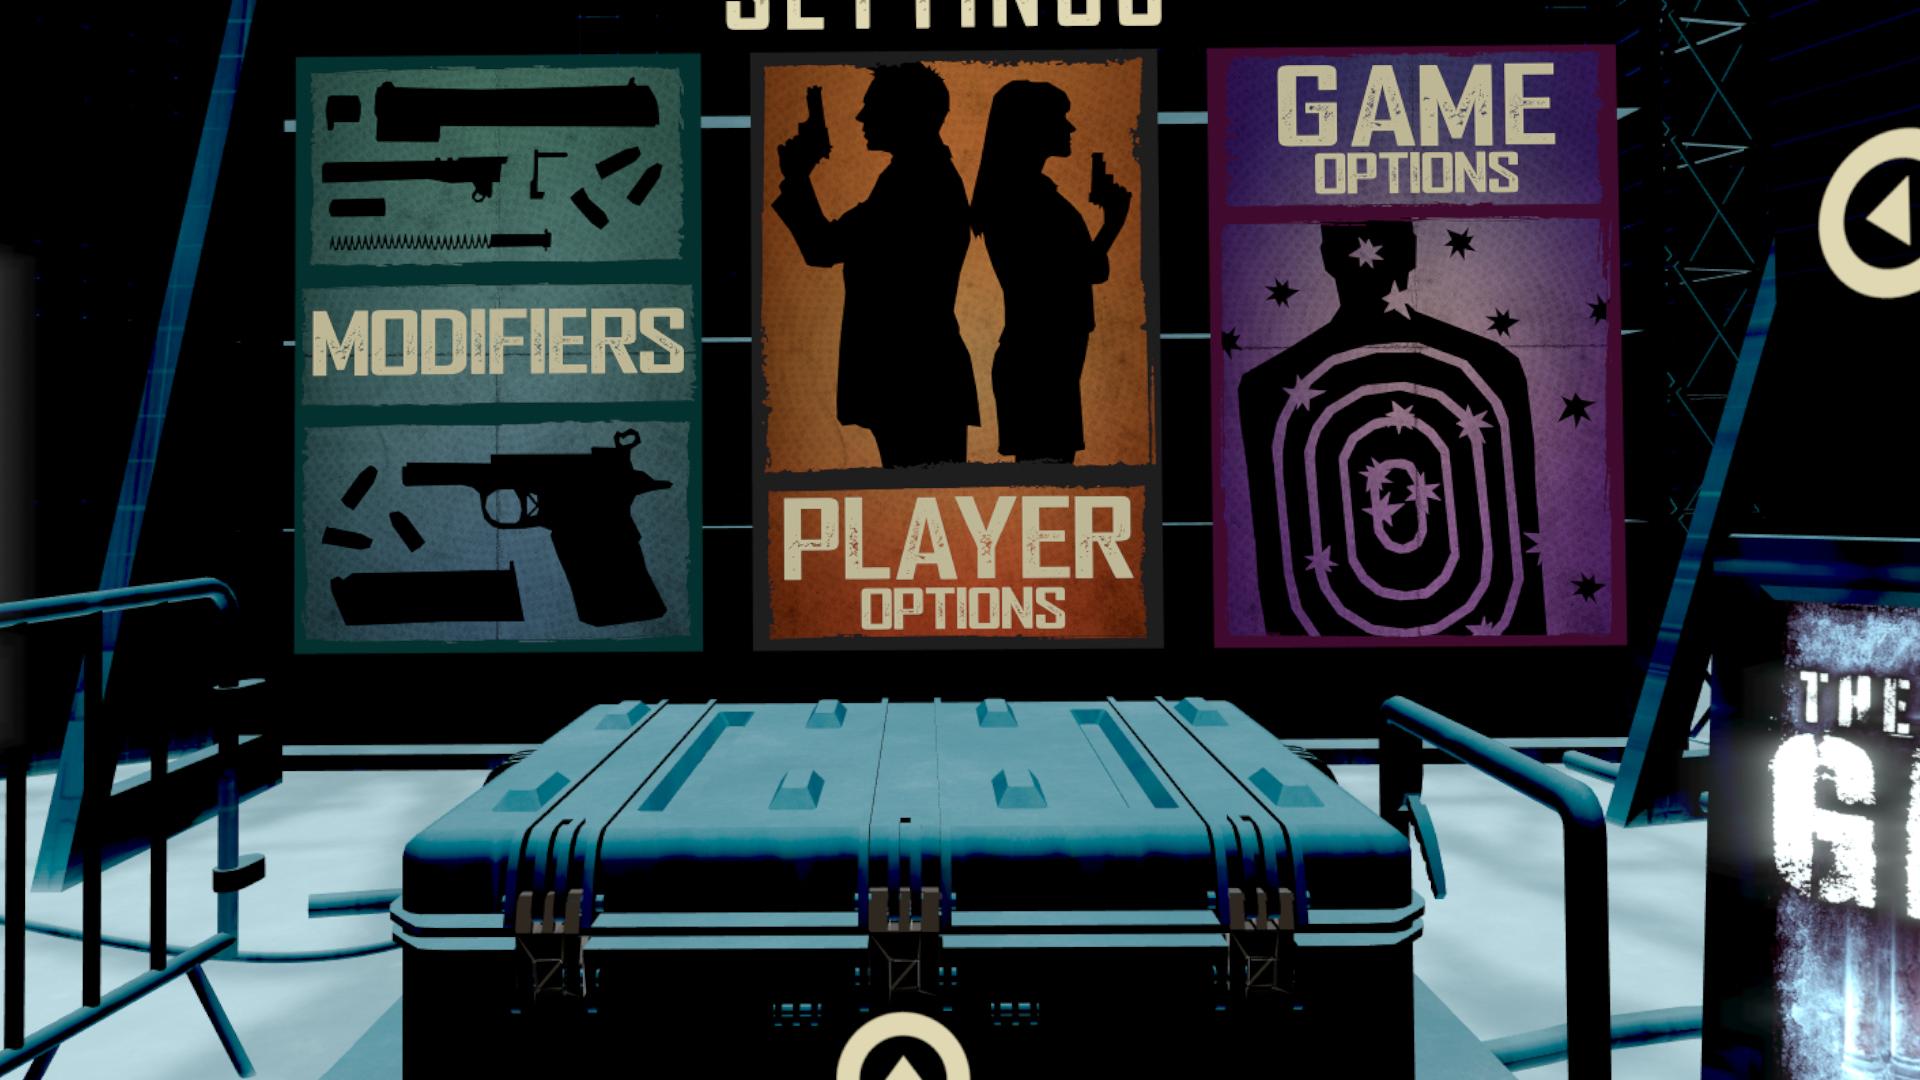 VRゲーム【Pistol Whip】の設定 二丁拳銃にもできる!